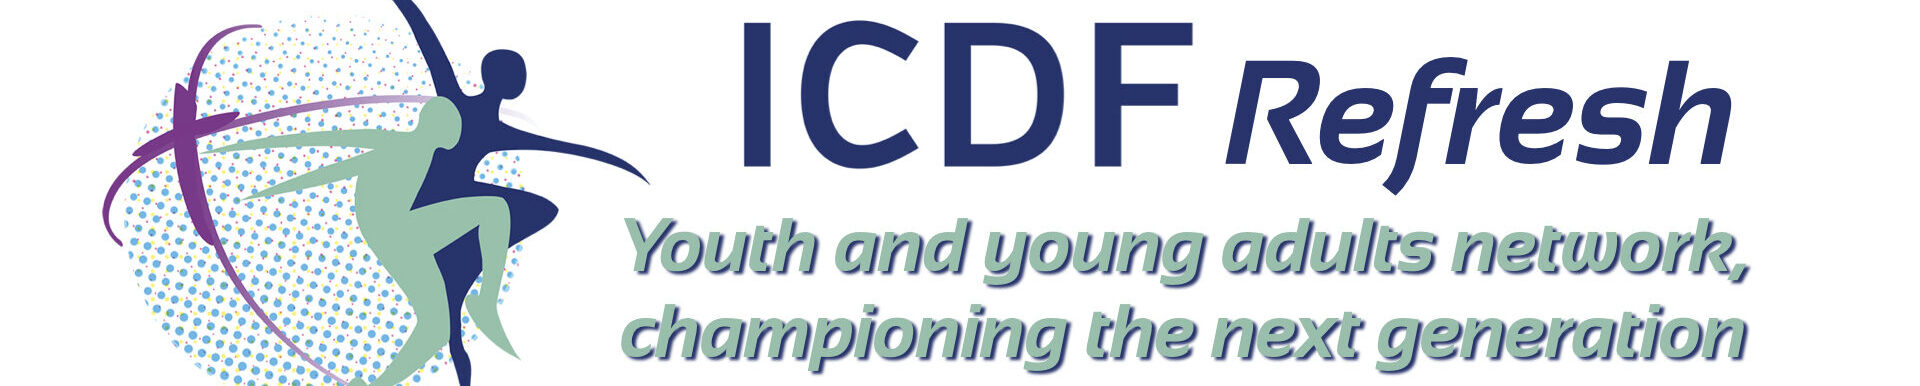 ICDF Refresh